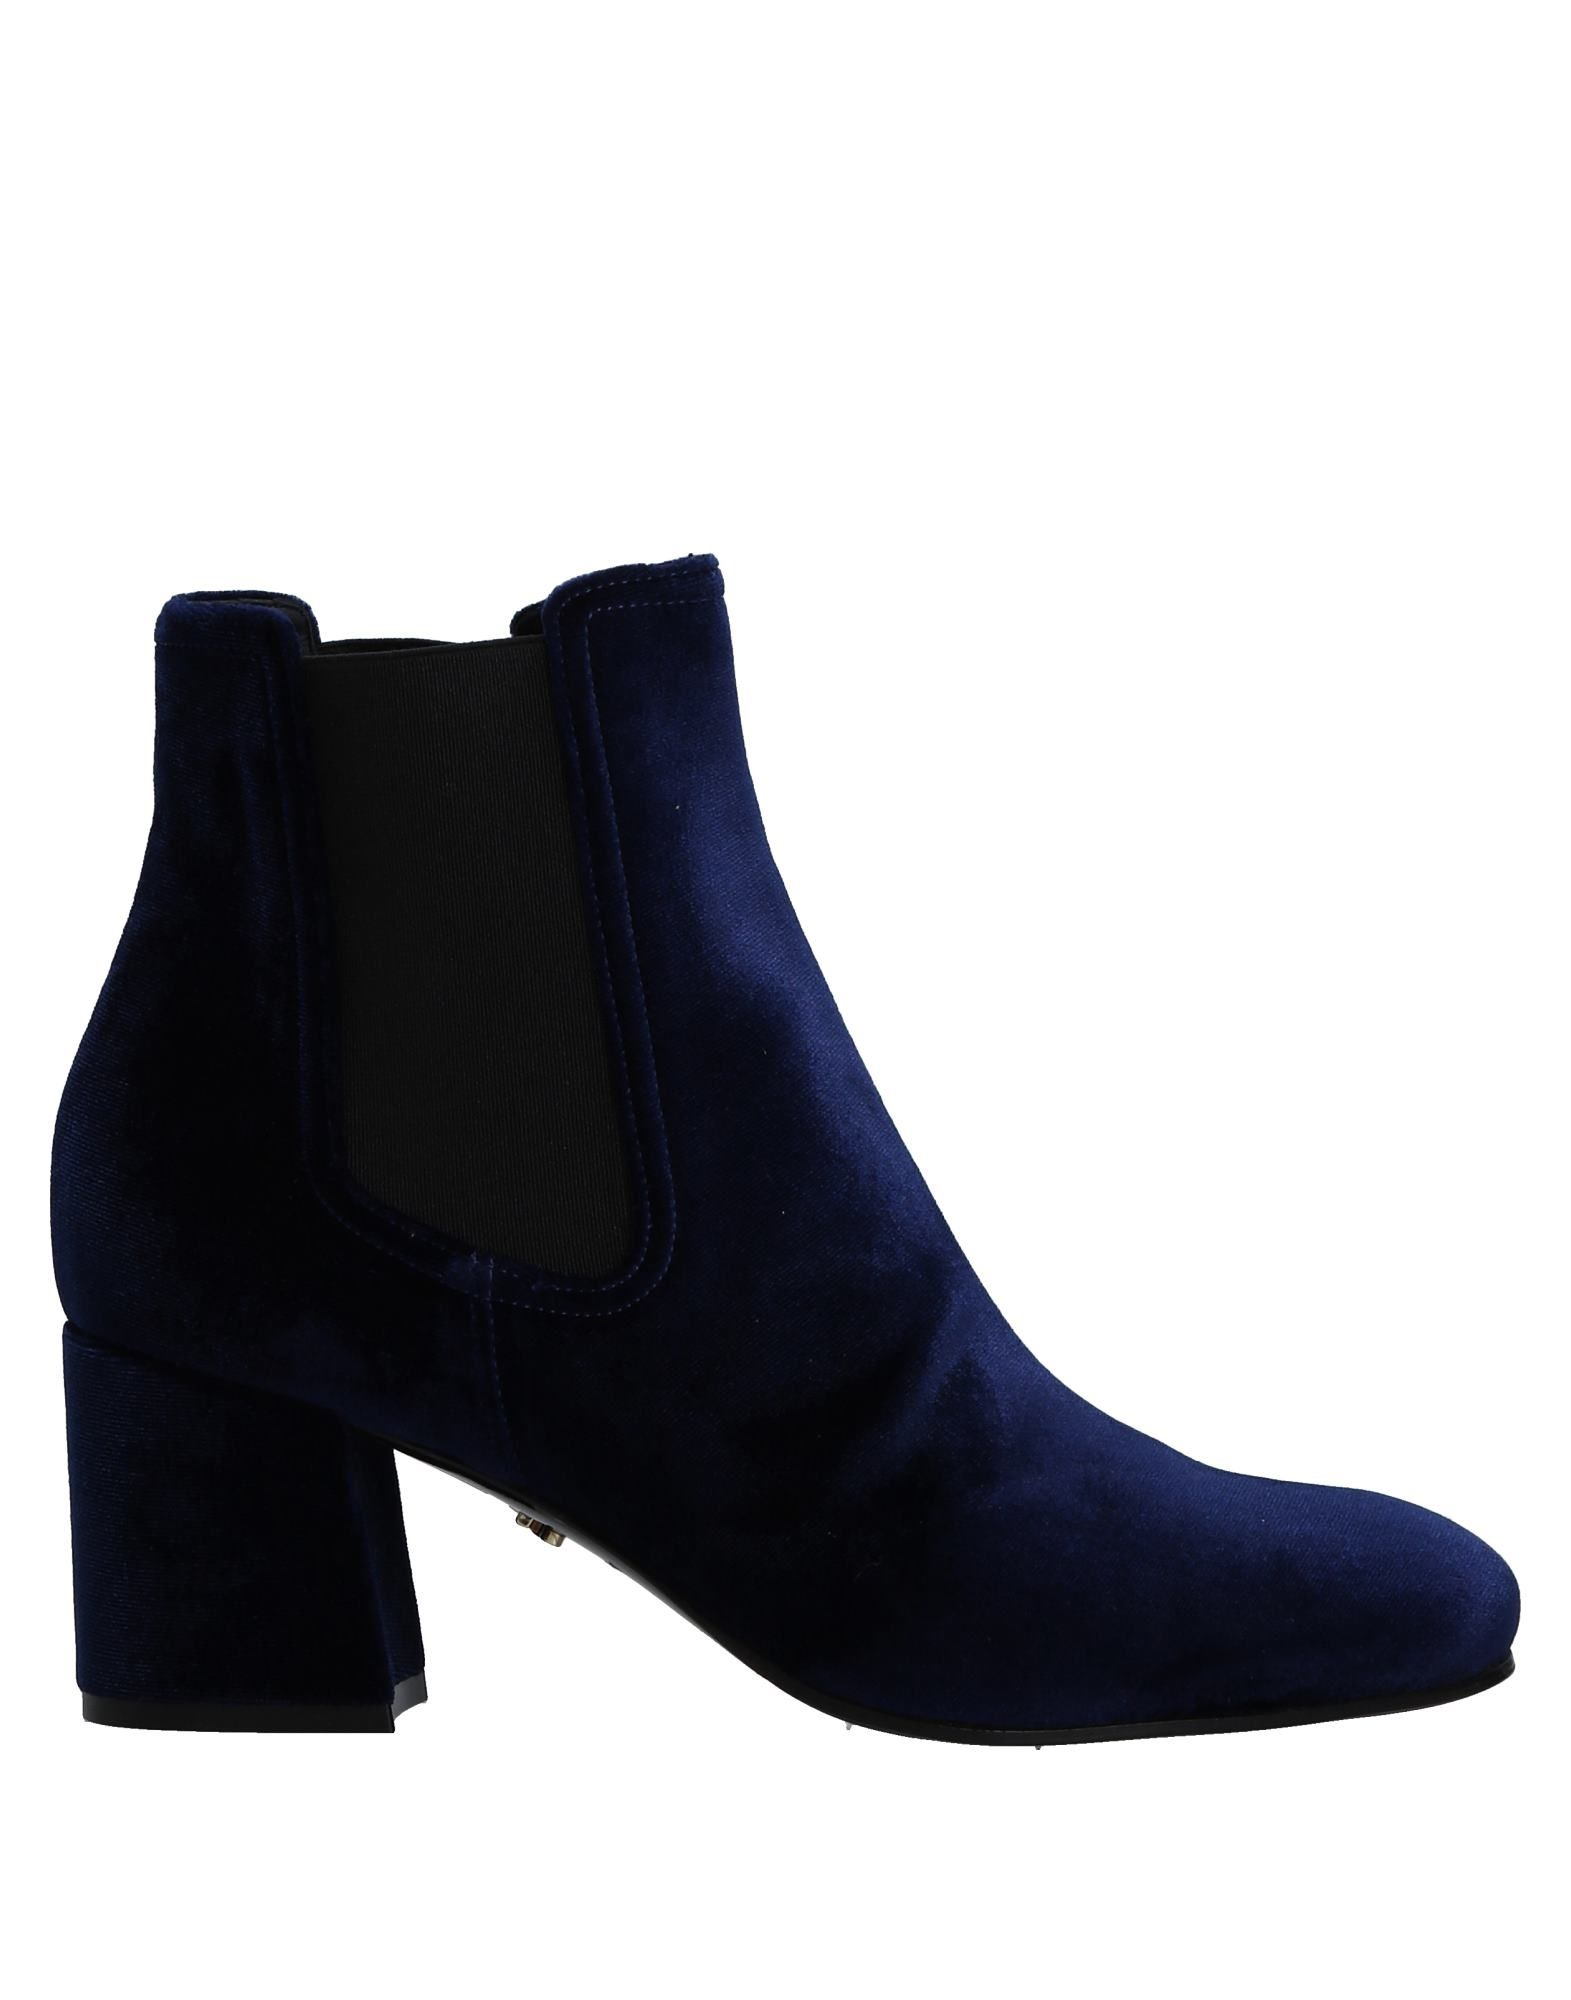 LE SILLA Полусапоги и высокие ботинки le stelle полусапоги и высокие ботинки